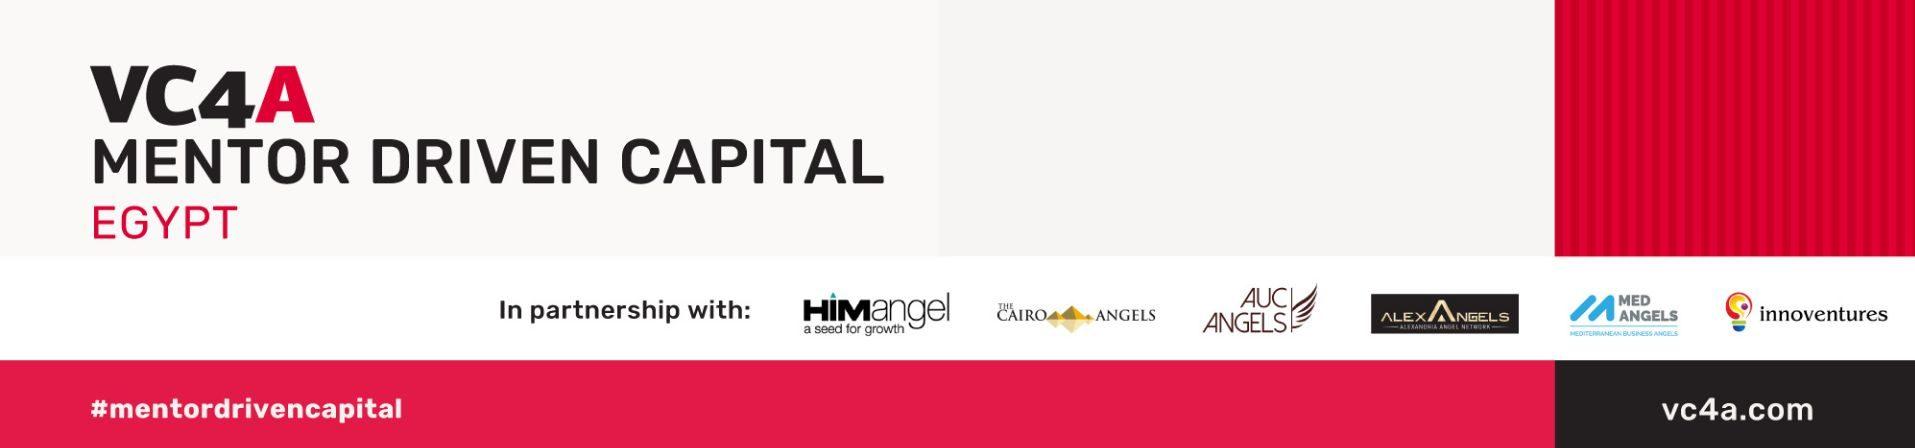 Mentor Driven Capital program Egypt 2019